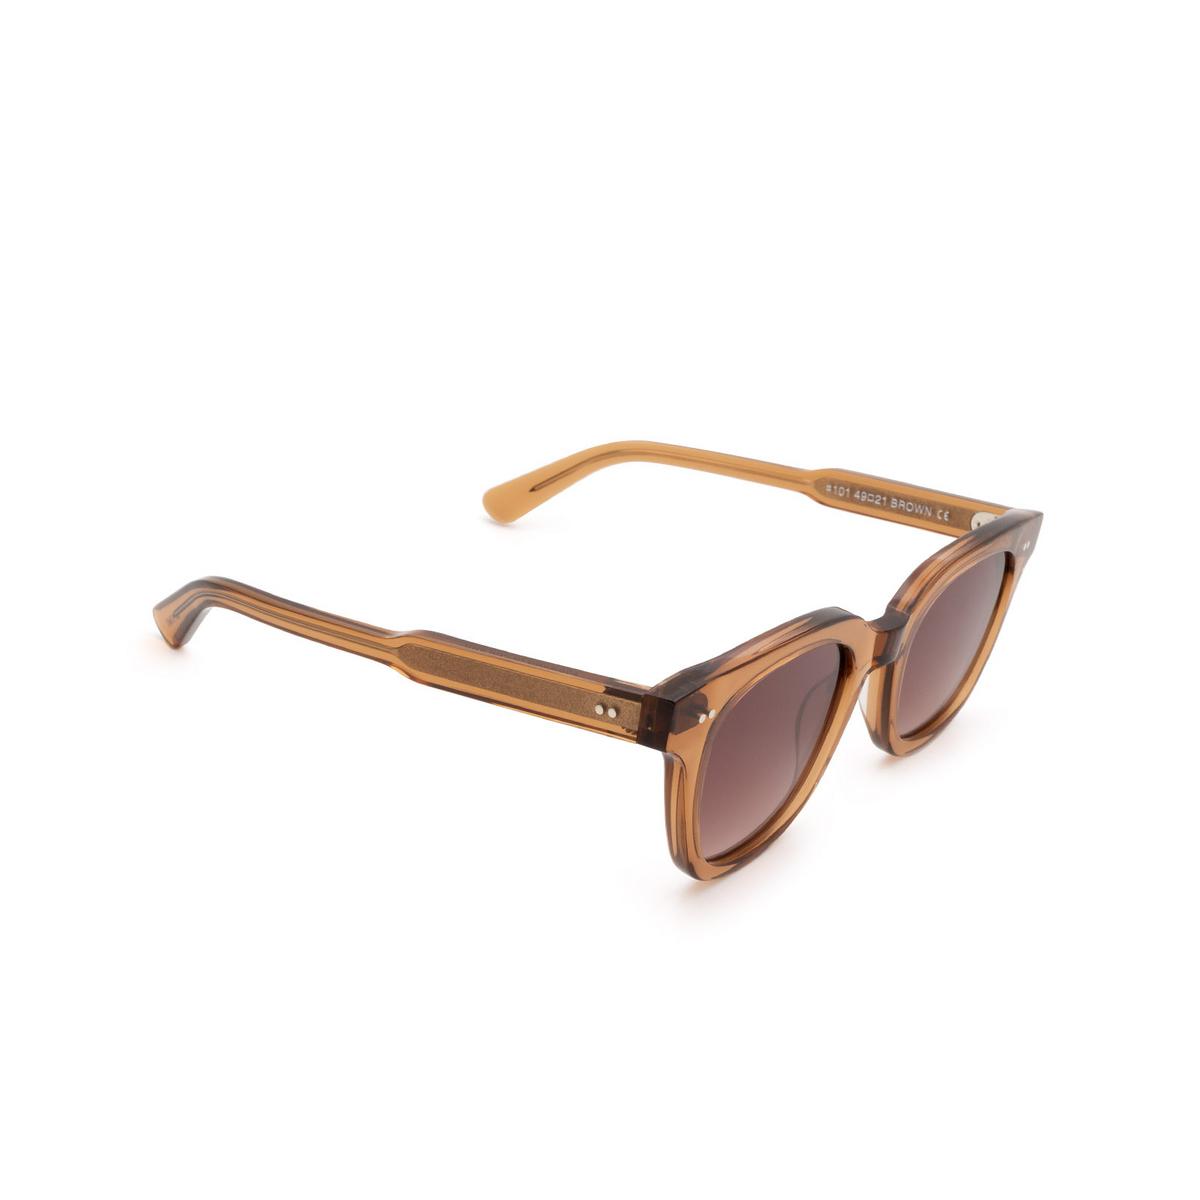 Chimi® Square Sunglasses: #101 color Brown Cinnamon Brown - three-quarters view.